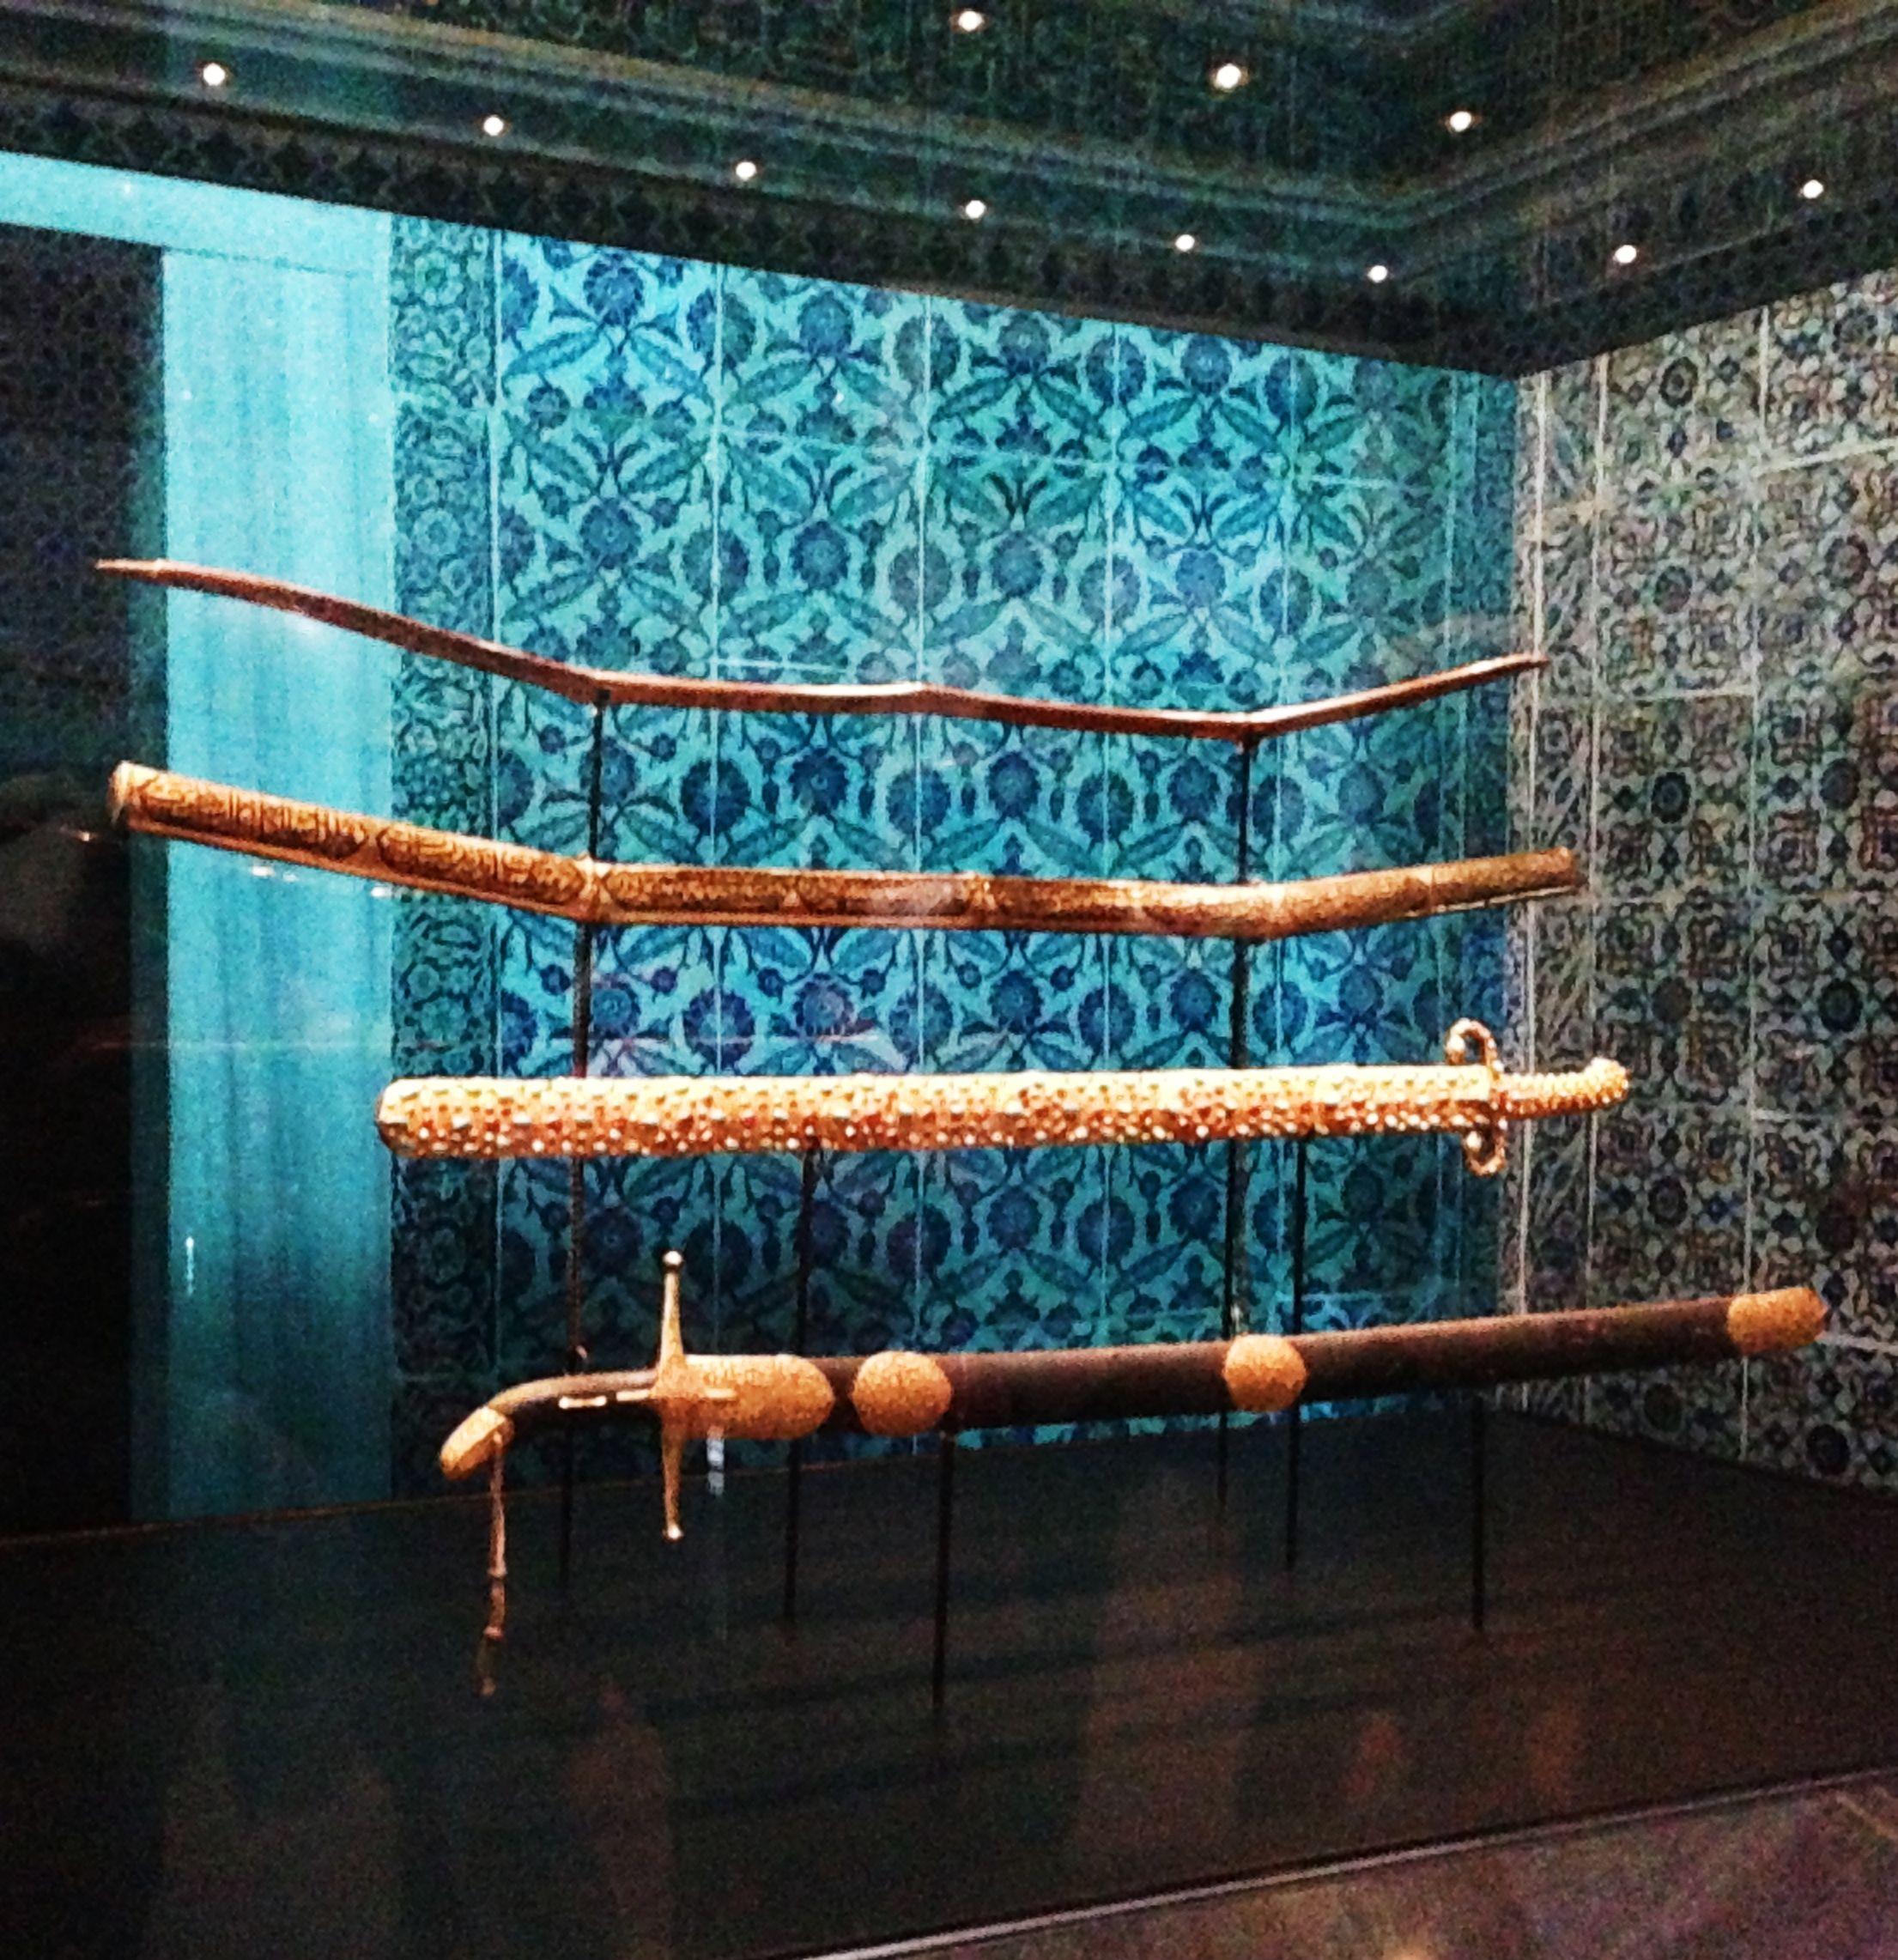 Prophet Mohammed S Swords Spears Peace Be Upon Him At Topkapi Palace S Museum Topkapi Sarayi In Istanbul Turkey Pho Topkapi Islamic World Islamic Art